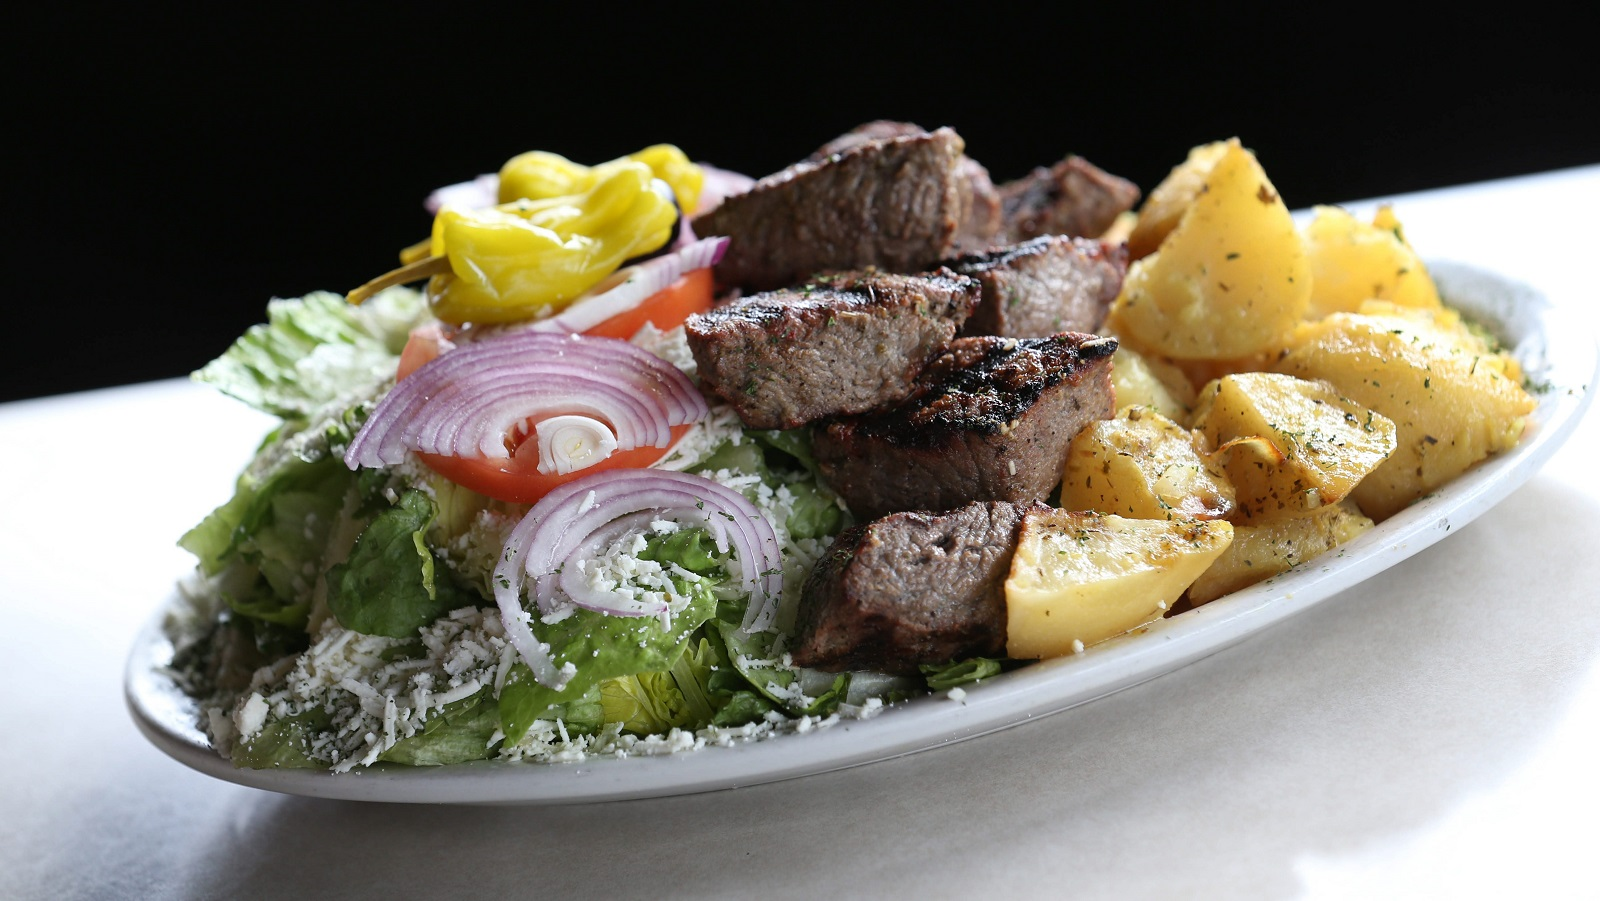 Zoe's beef souvlaki dinner with charbroiled, marinated Angus beef. (Sharon Cantillon/Buffalo News)